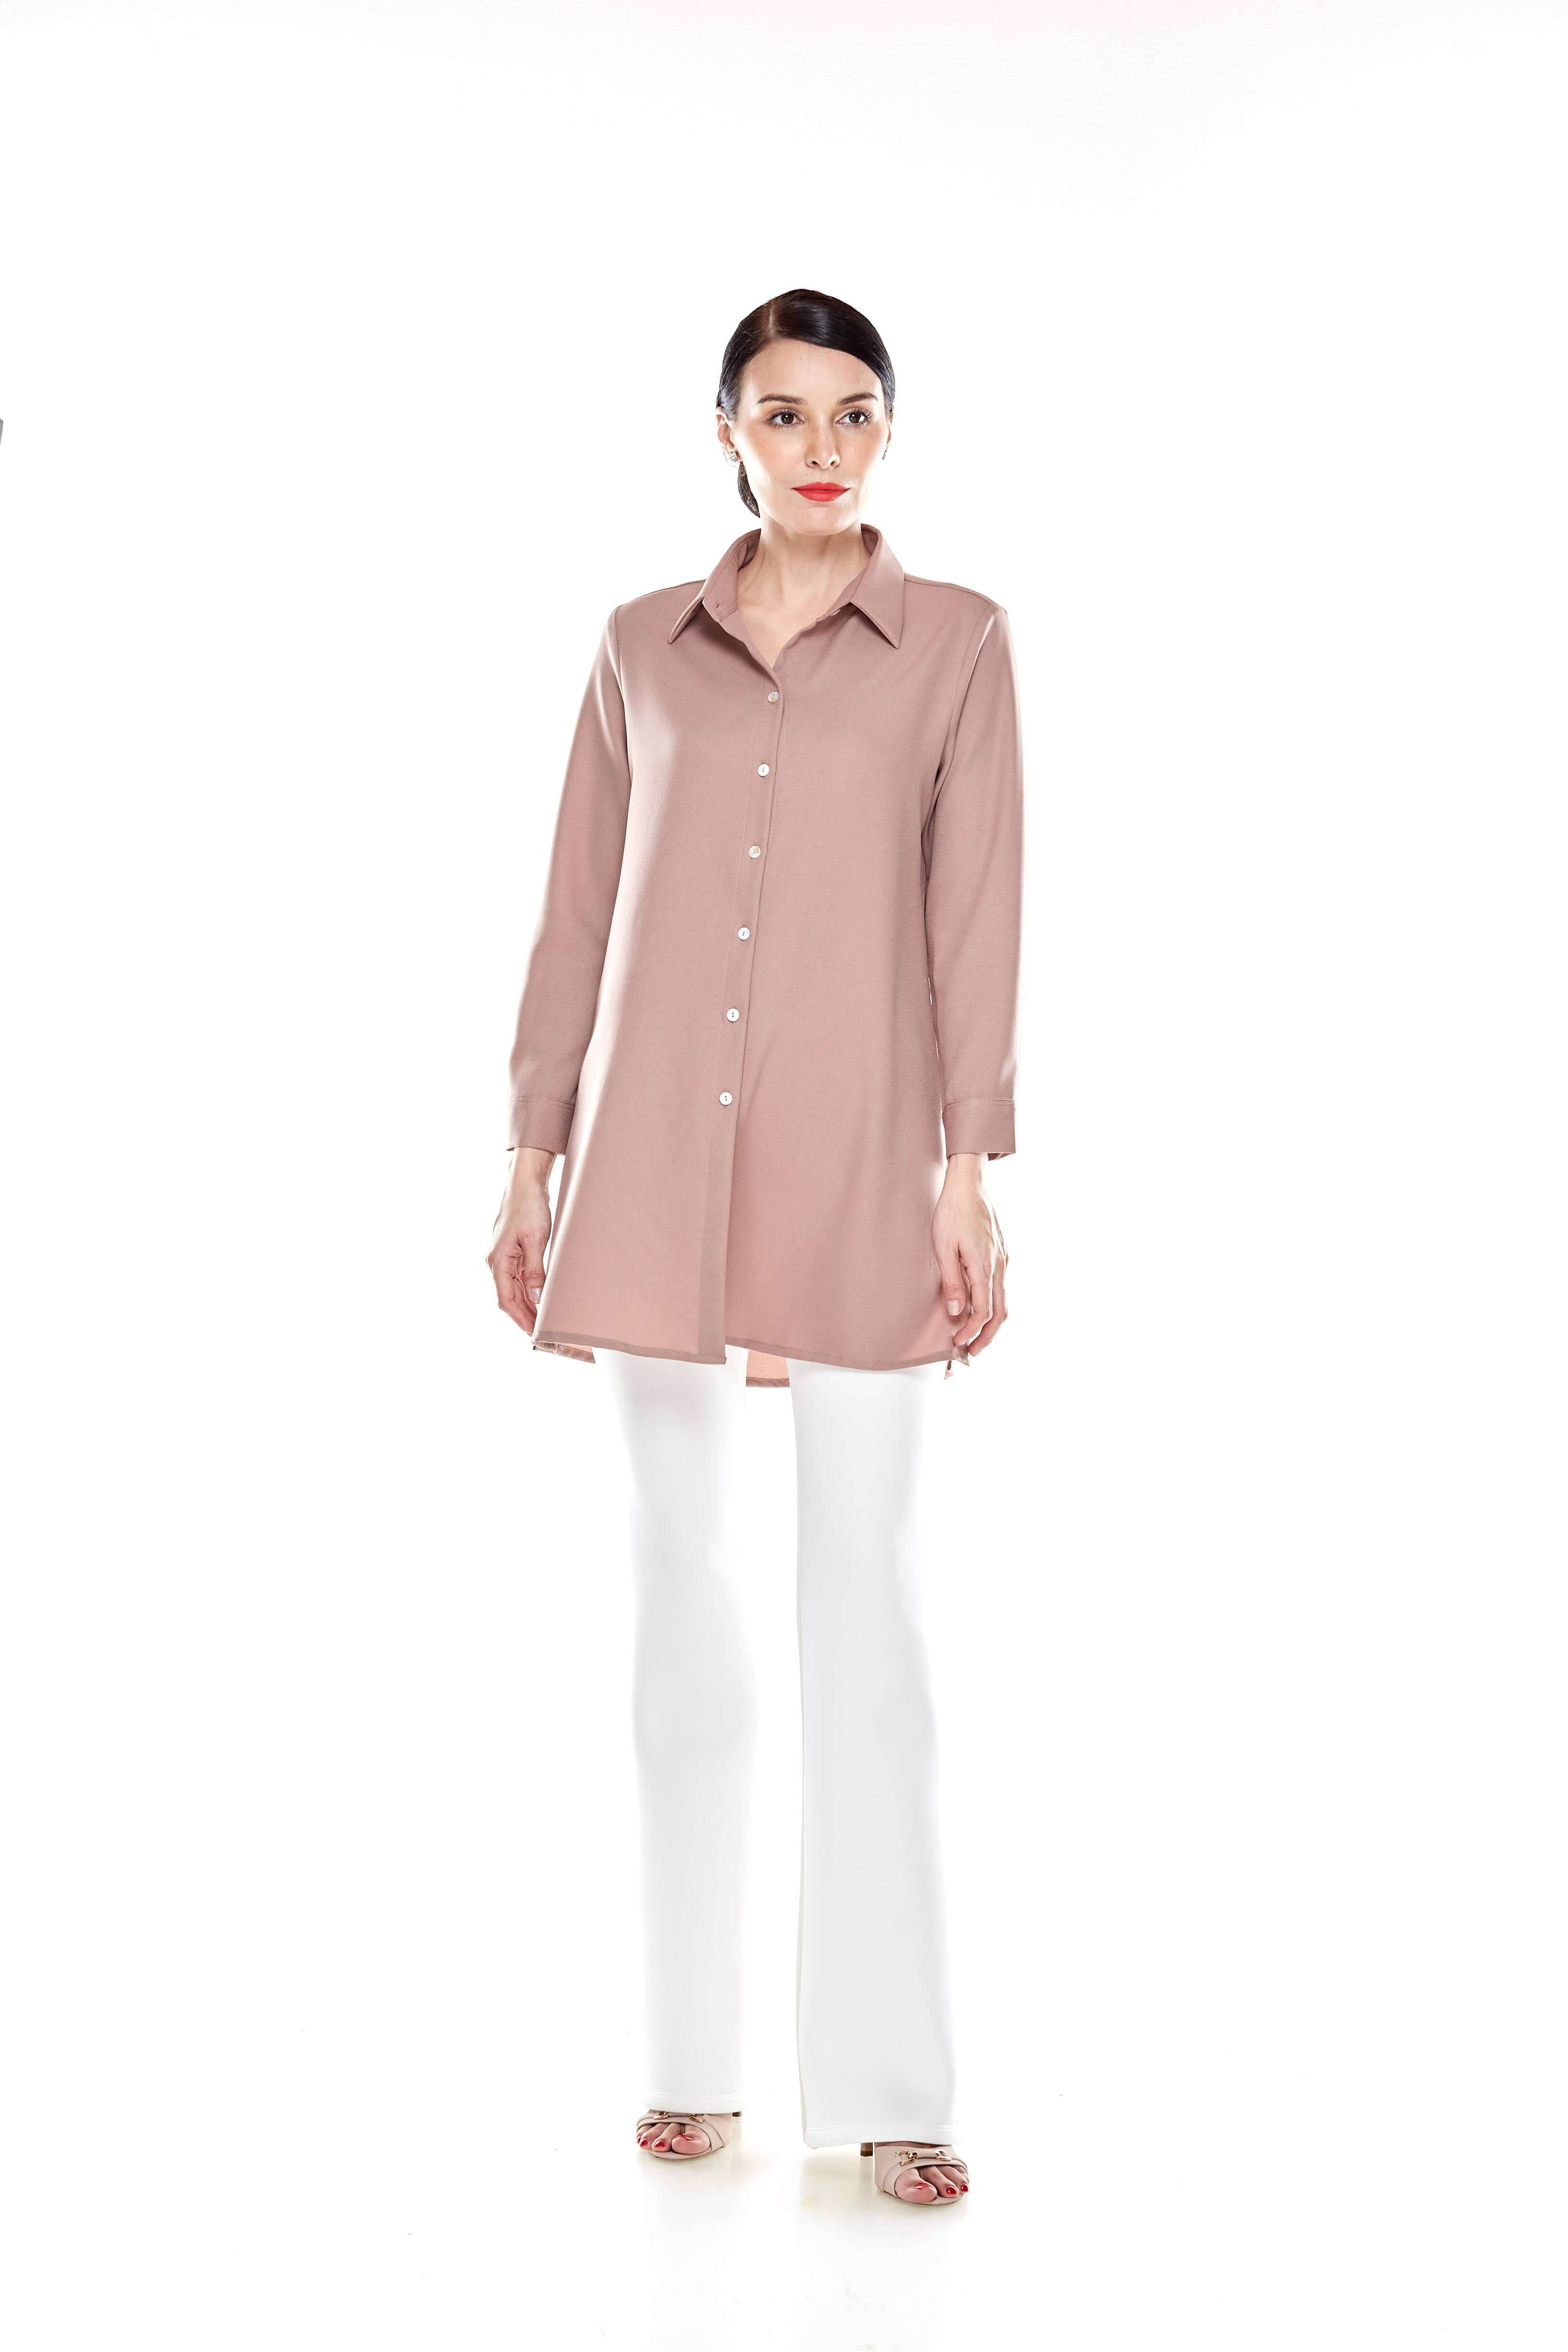 Warm Taupe Shirt Blouse (10)